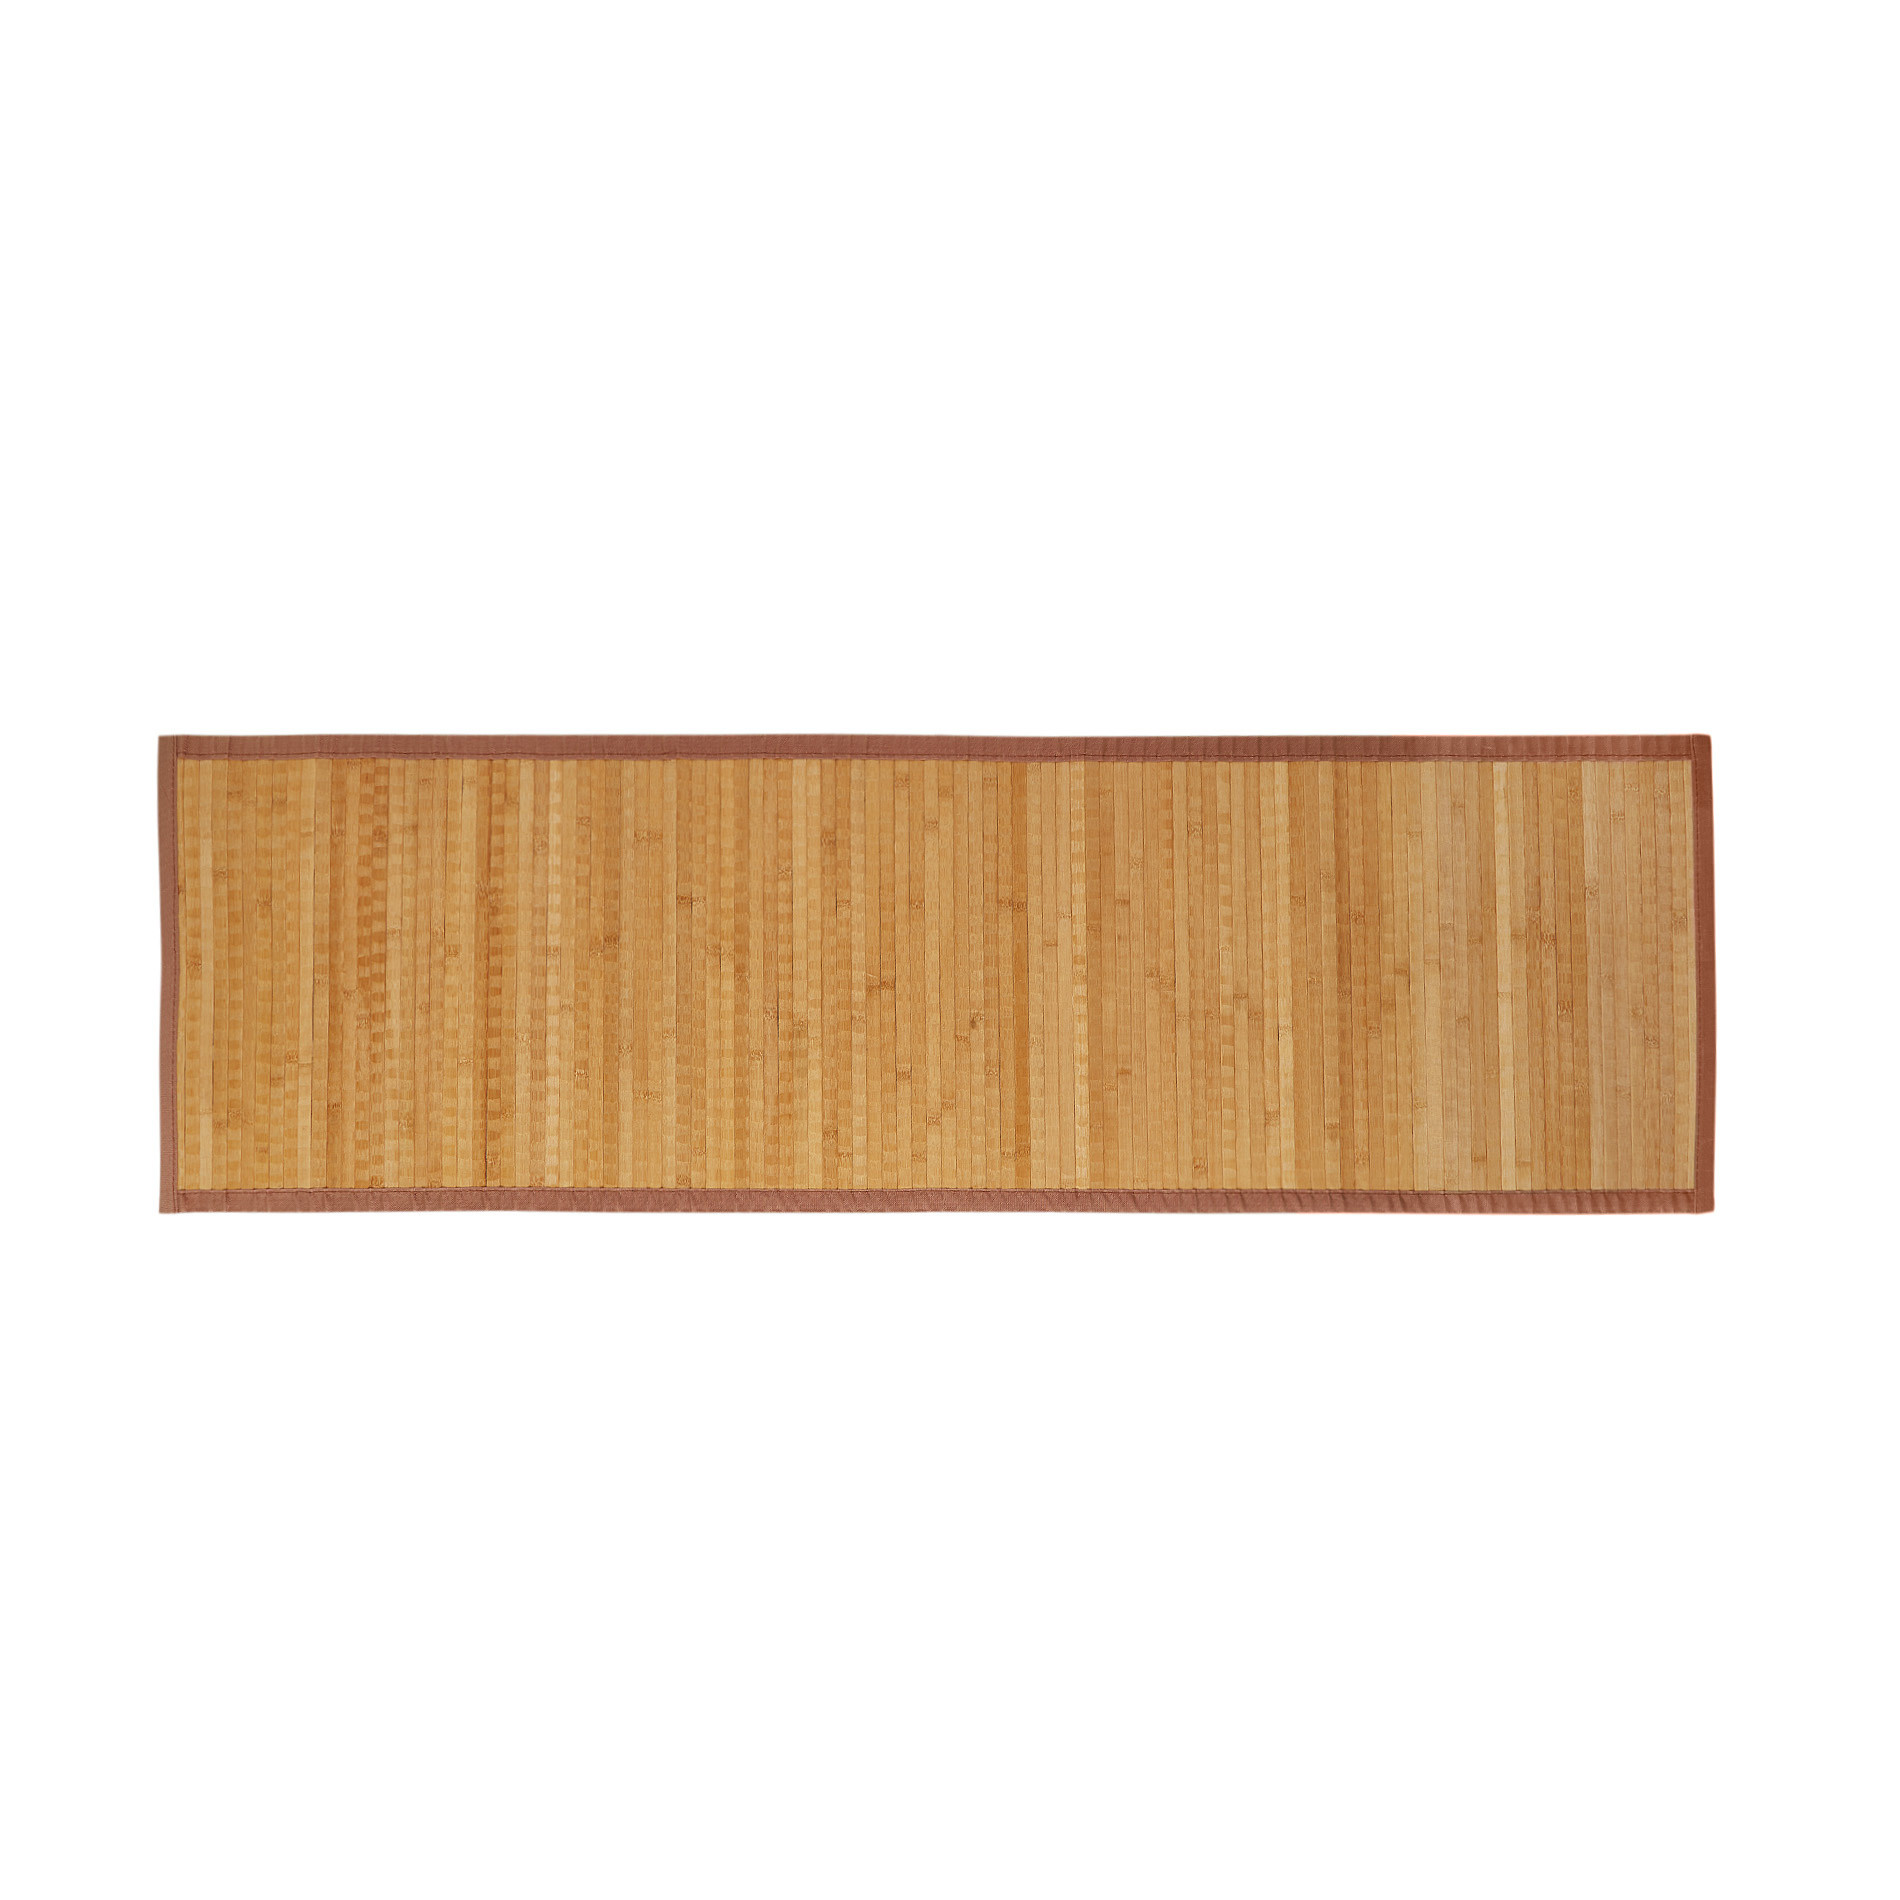 Sottolavello in bamboo tinta unita, Beige, large image number 0